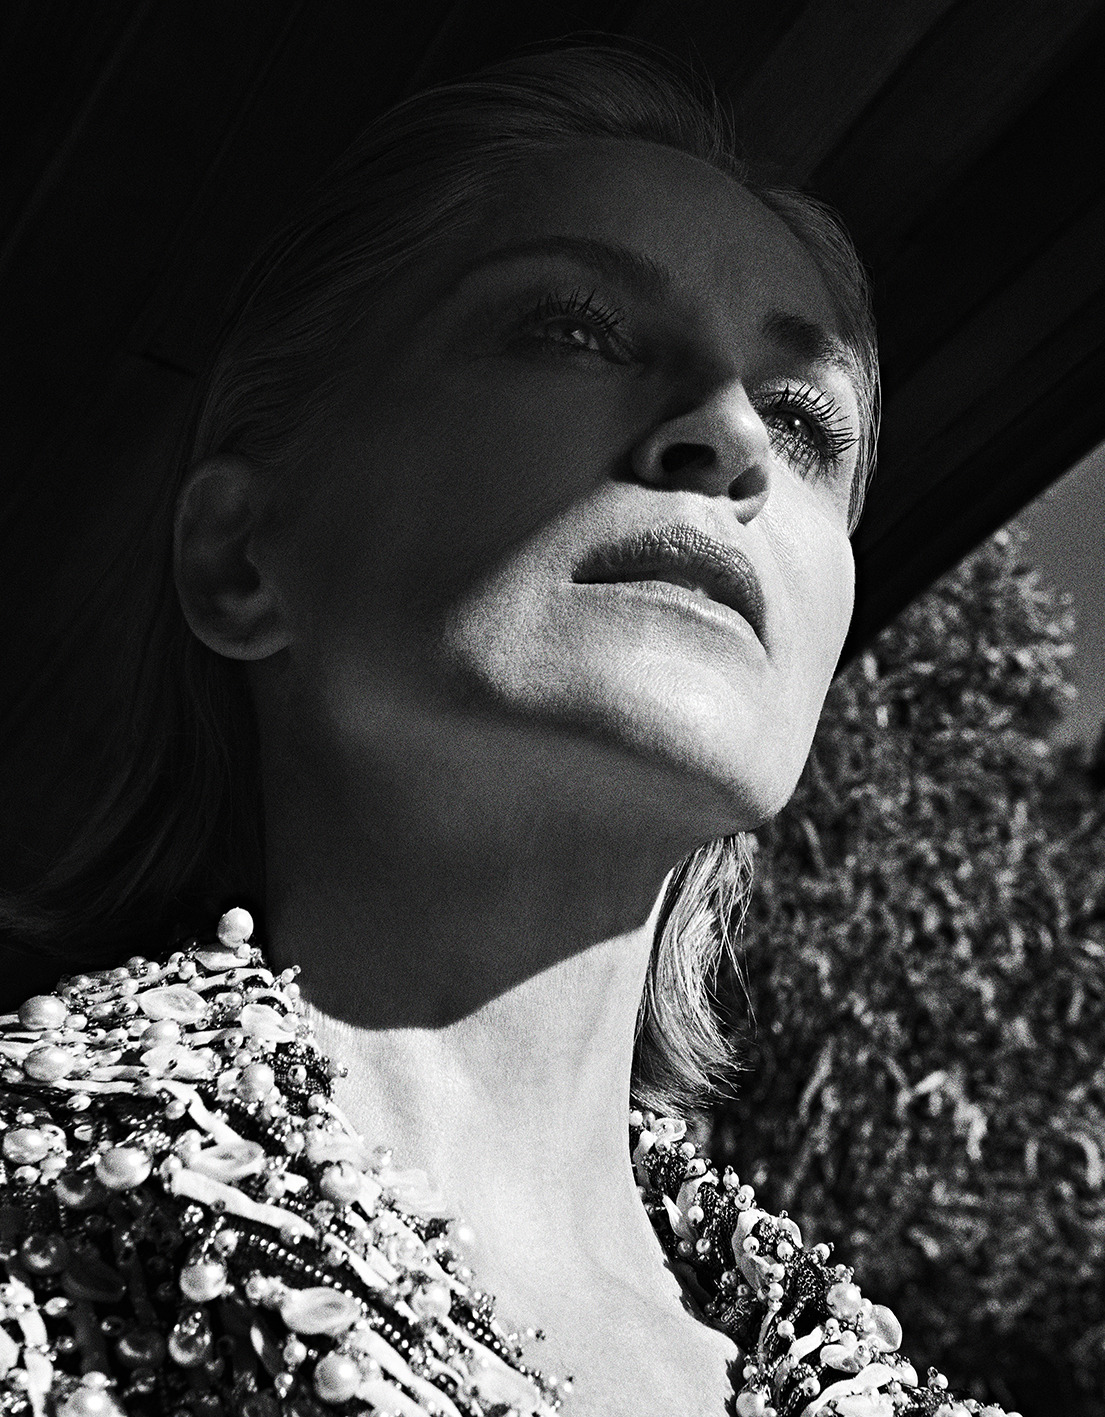 Sharon Stone by Branislav Simoncik for Vogue Portugal May 2019 (6).jpg